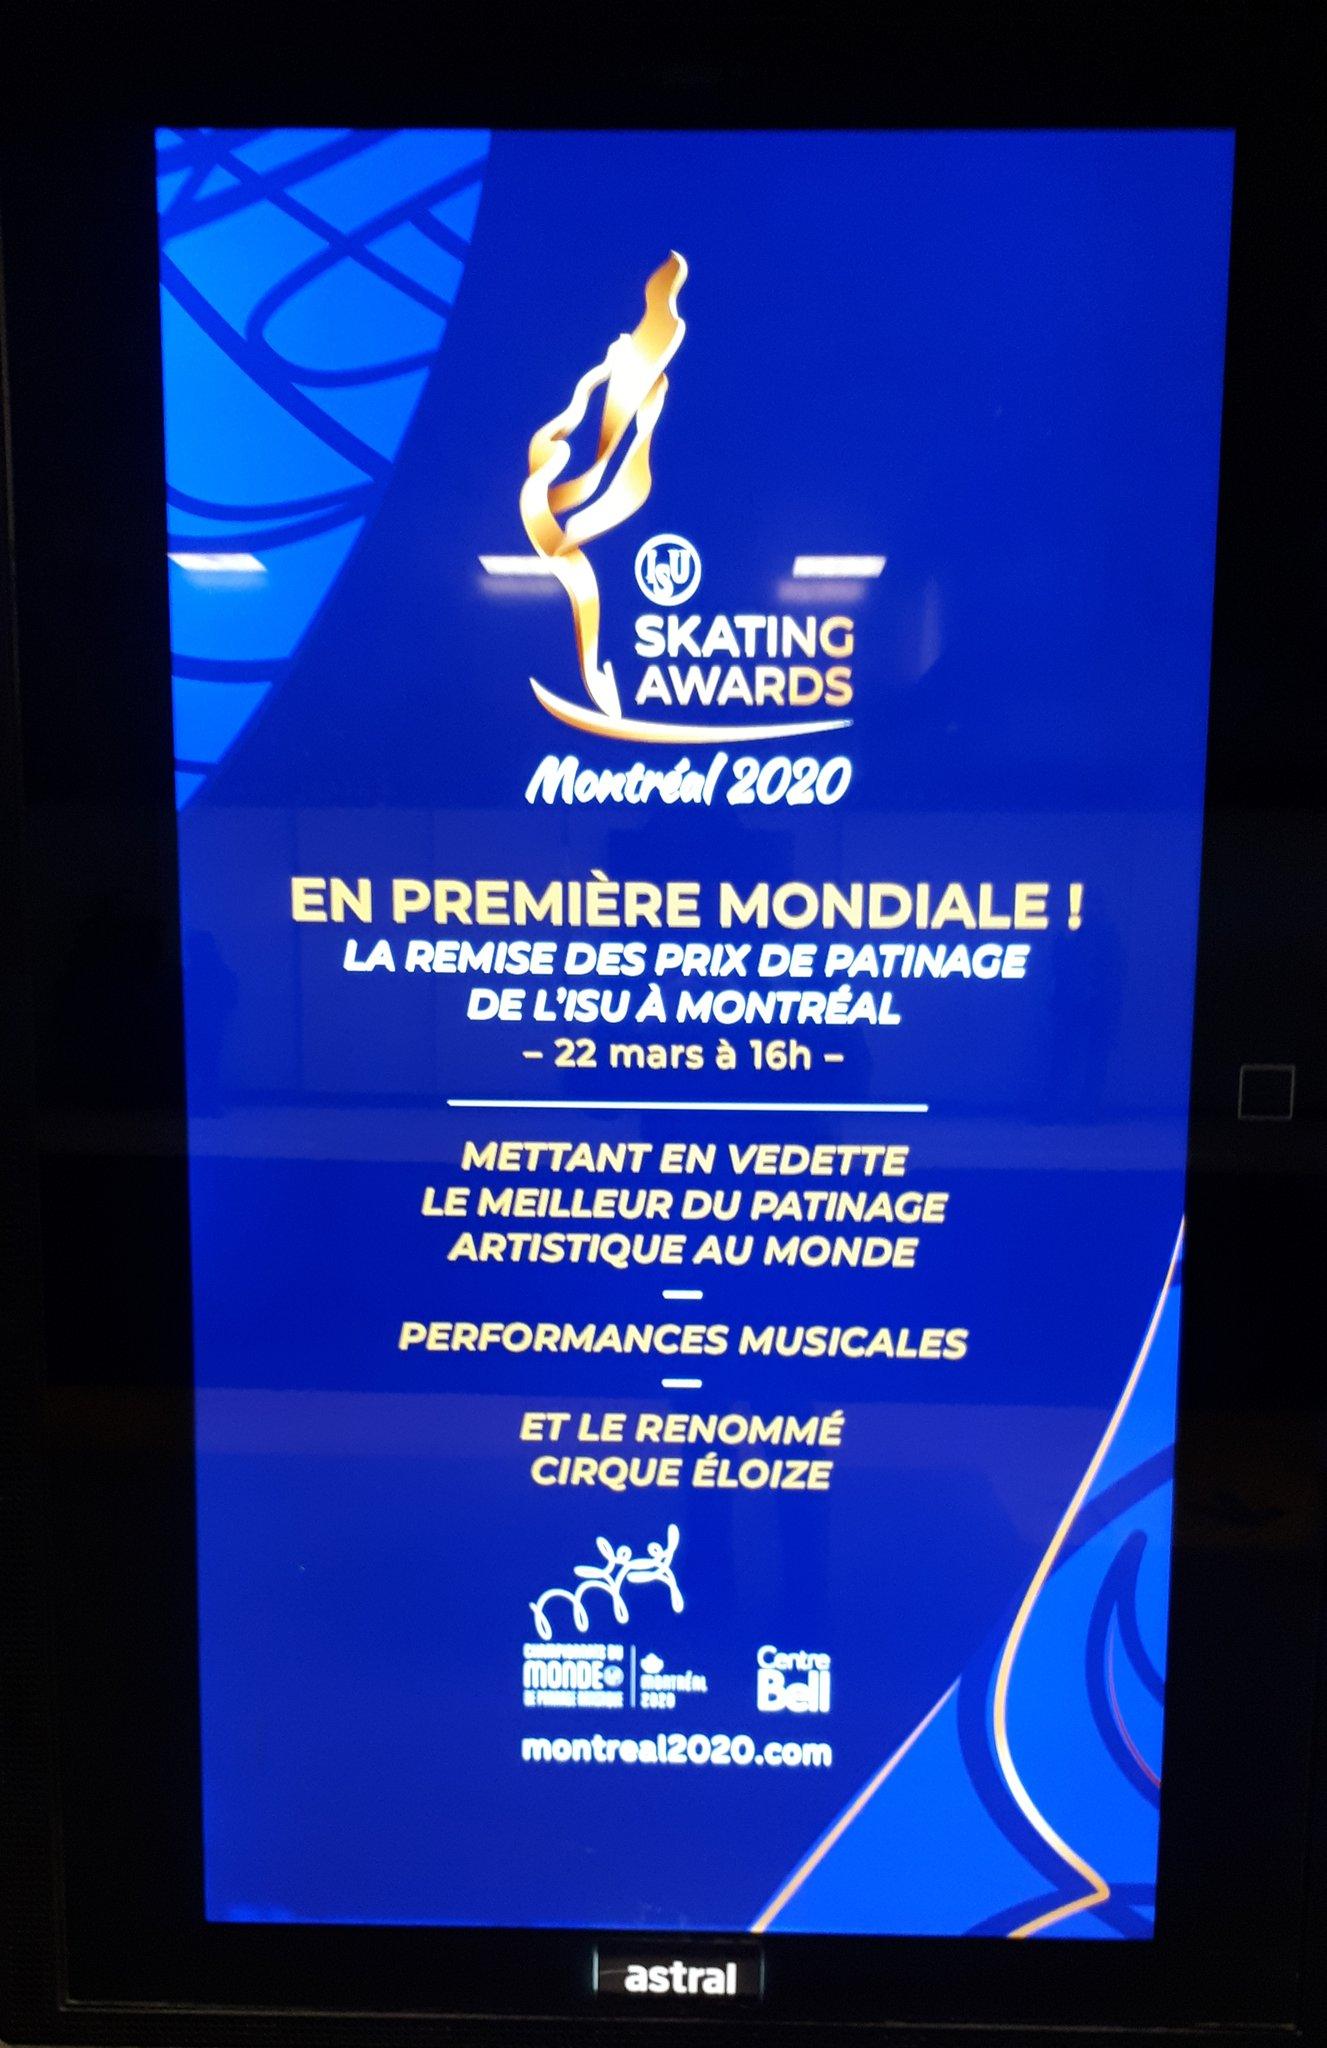 Чемпионат мира-2020 по фигурному катанию в Монреале ОТМЕНЕН! - Страница 2 ESNK8oNWoAYrFgY?format=jpg&name=large